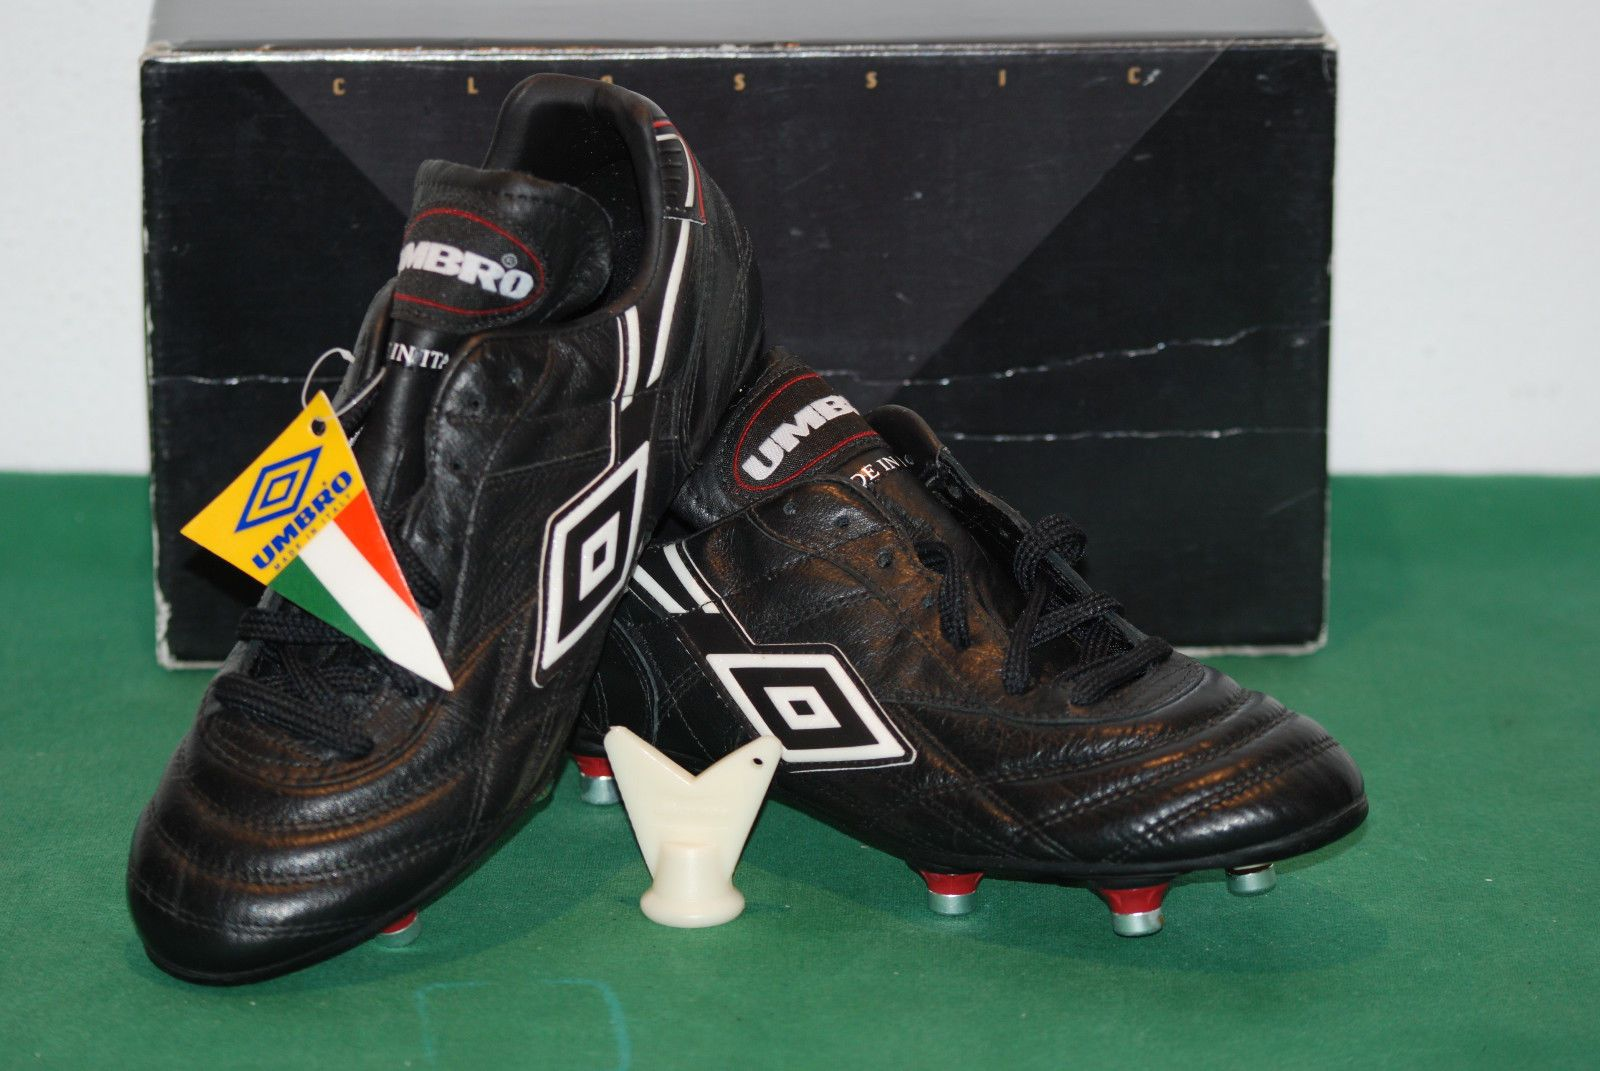 277358fa94 vintage UMBRO PELE SUPREME scarpe calcio 80s fluo juve soccer boots  kangaroo 90s